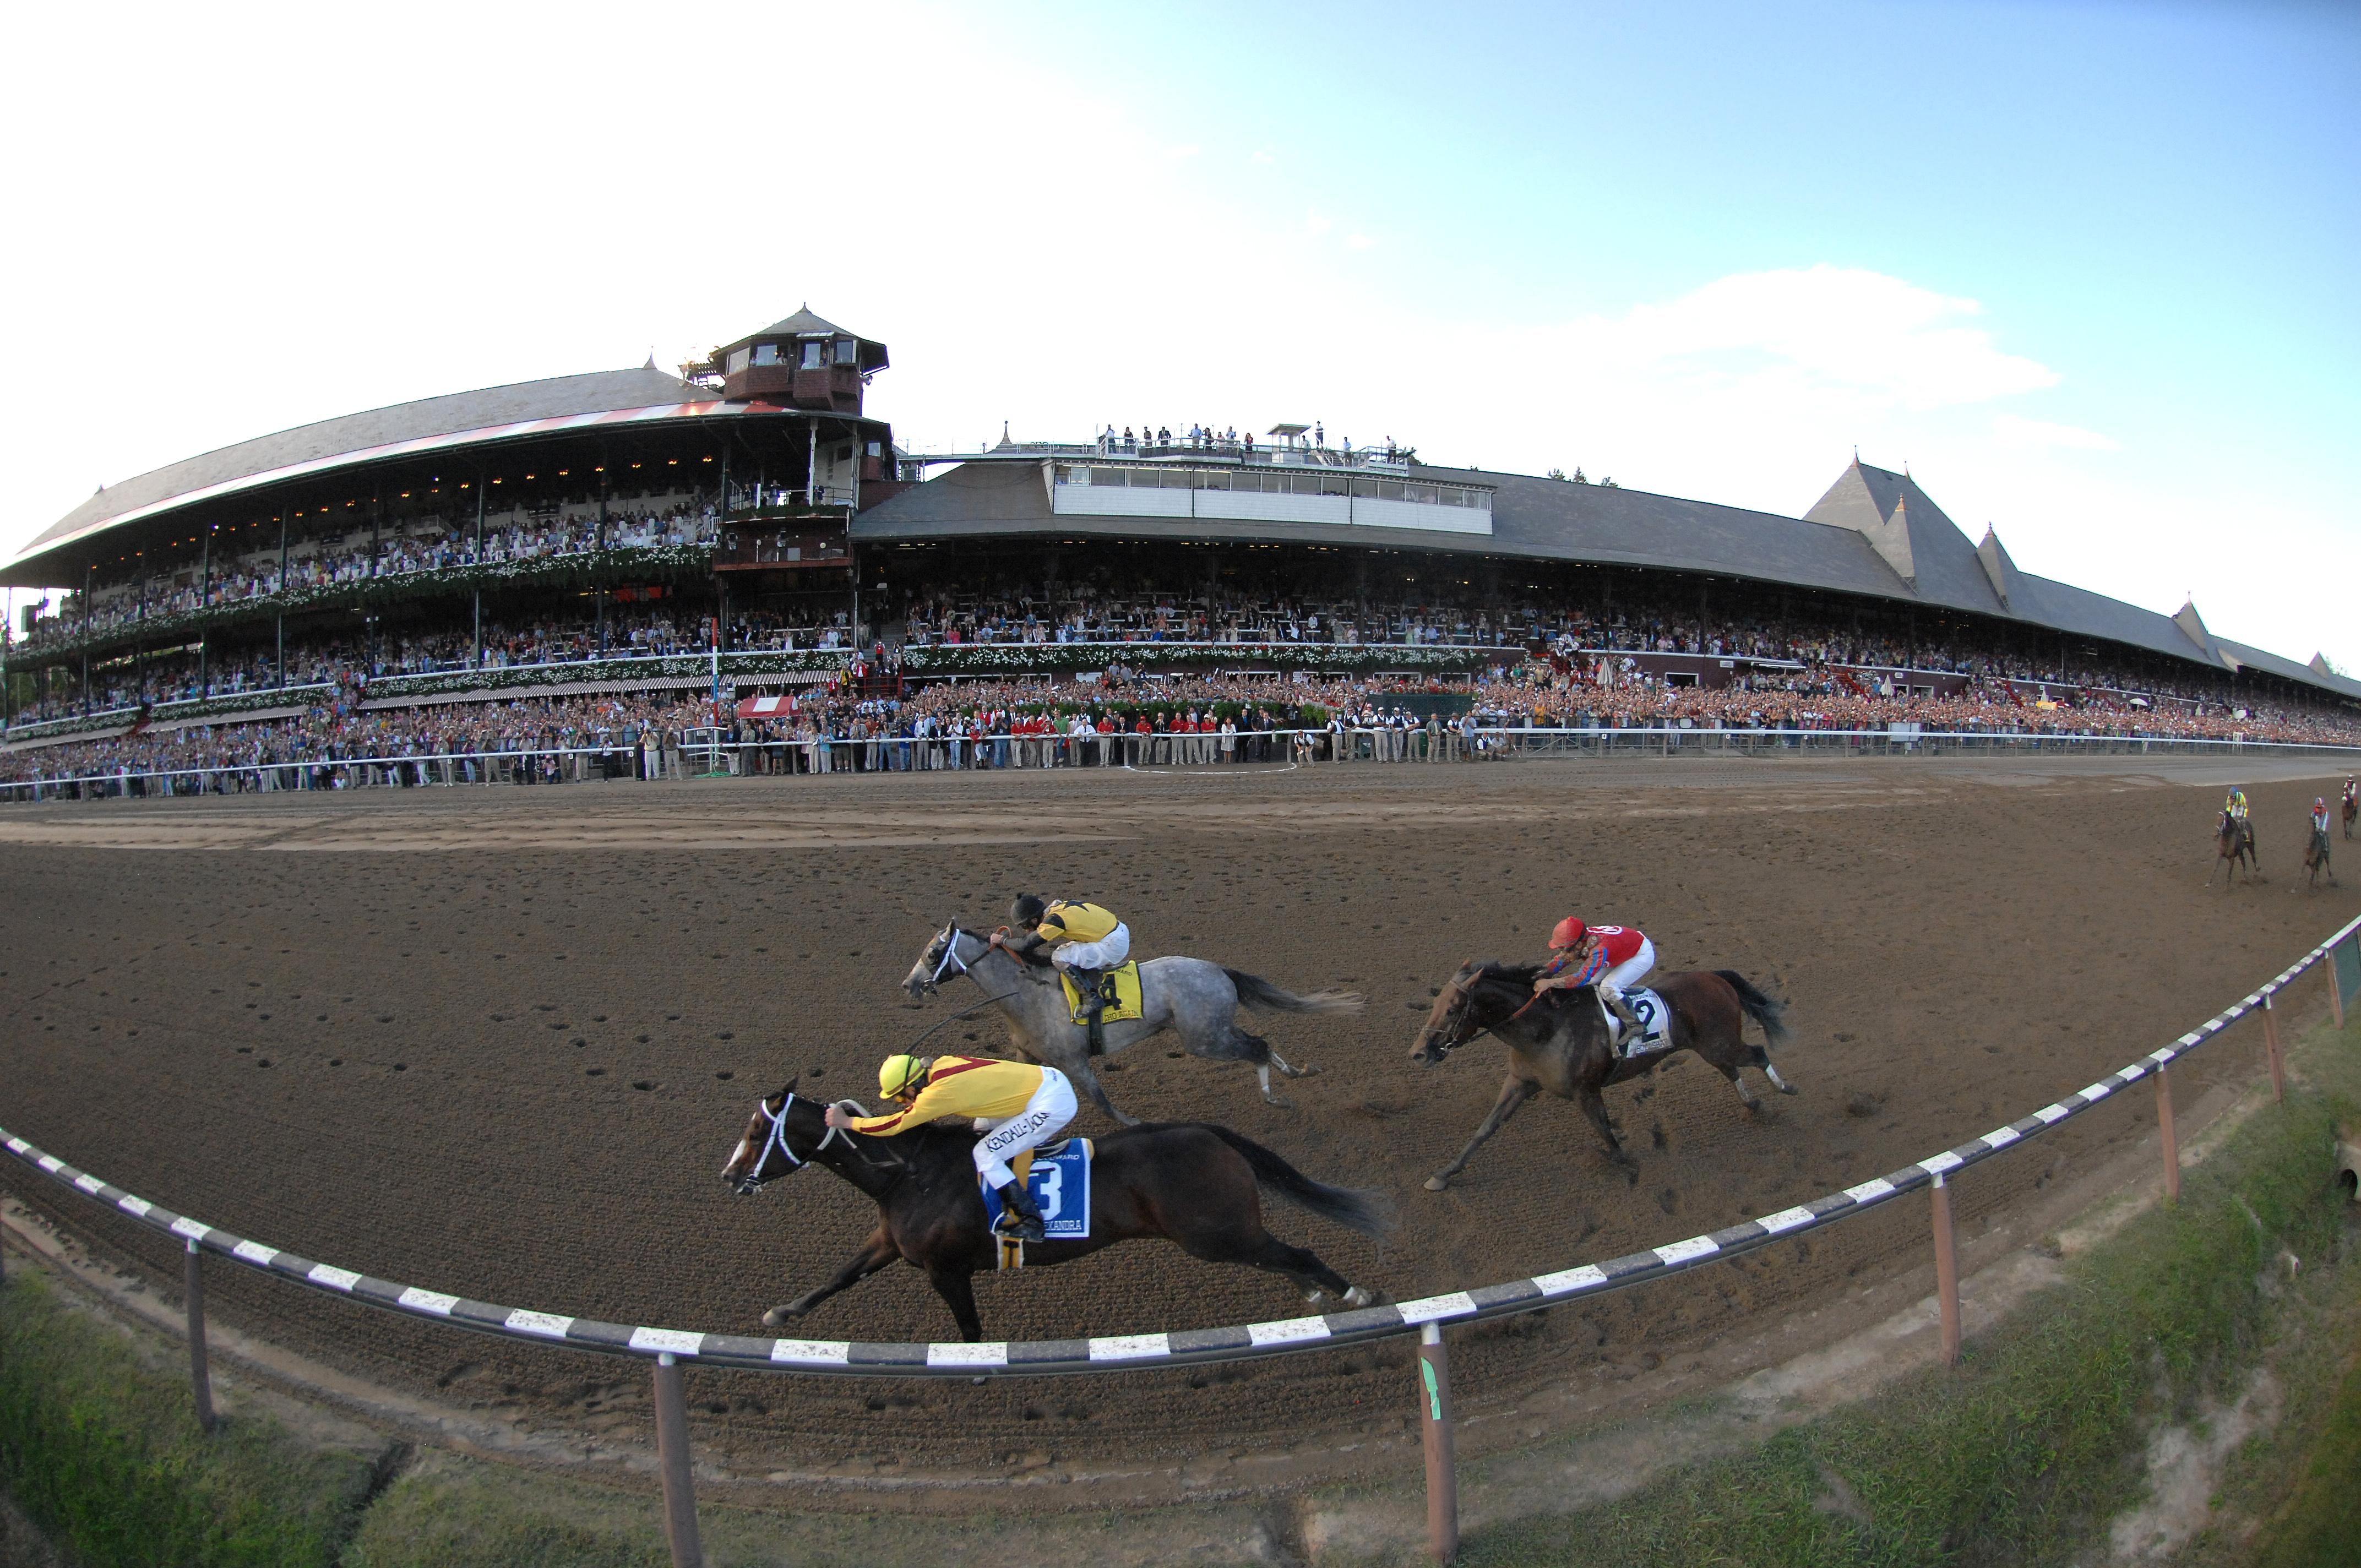 Rachel Alexandra winning the 2009 Woodward Stakes, Calvin Borel up (NYRA)